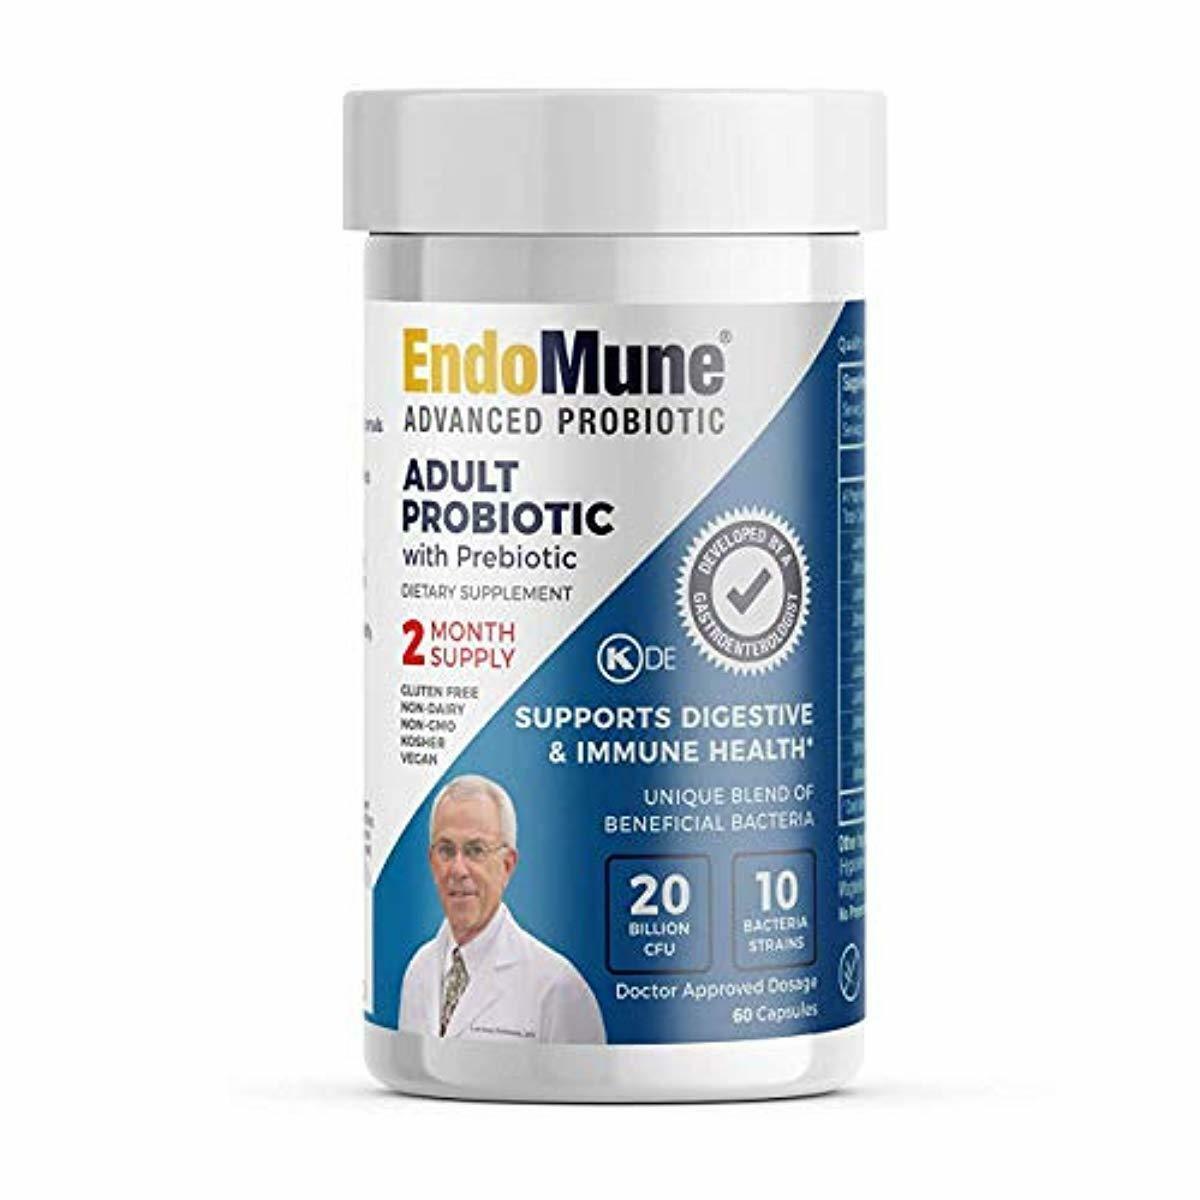 EndoMune Advanced Adult Multi-Strain Probiotic Supplement wi